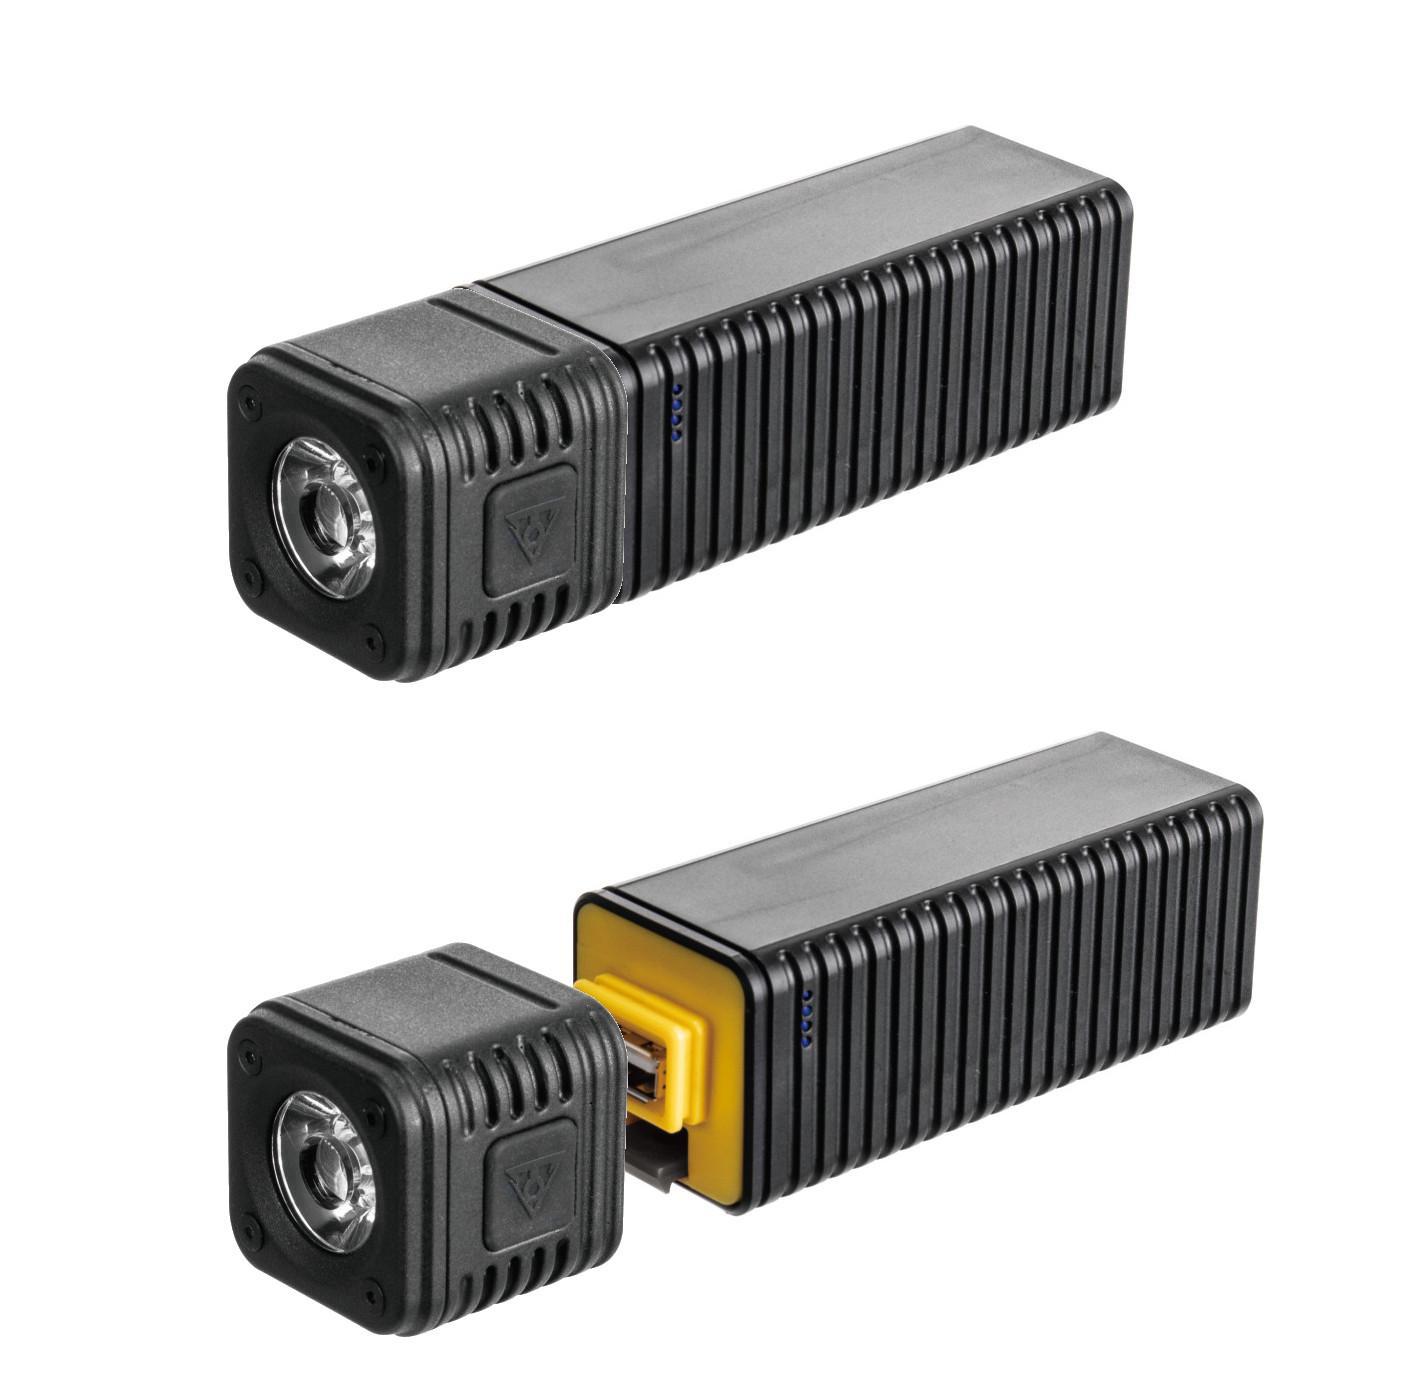 Topeak CubiCubi 1200 / 850 / 500 Scheinwerfer